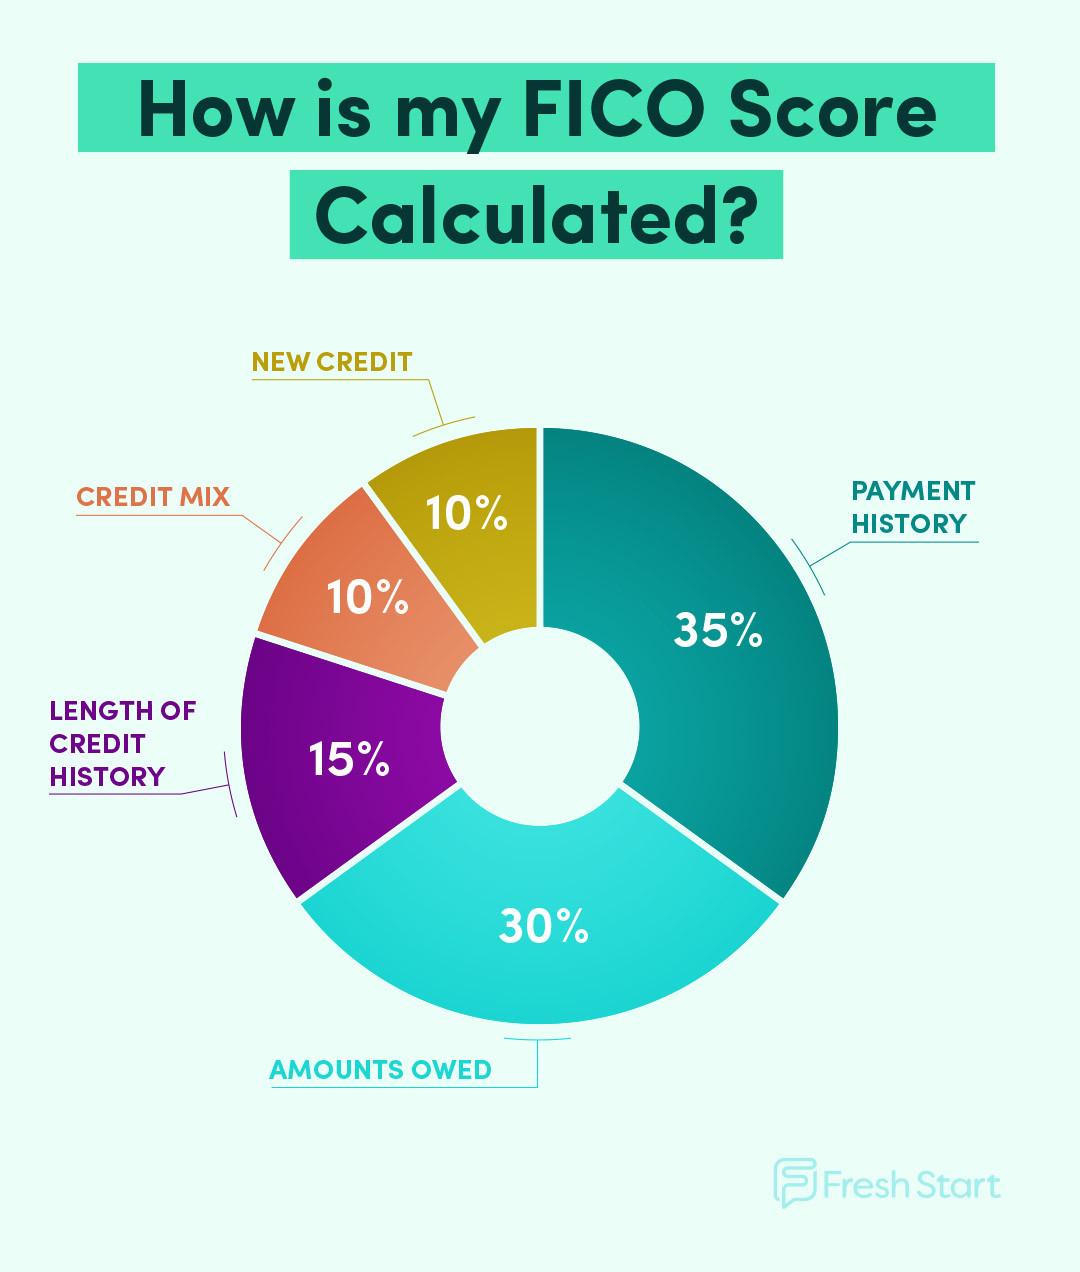 Factors that make up your credit score